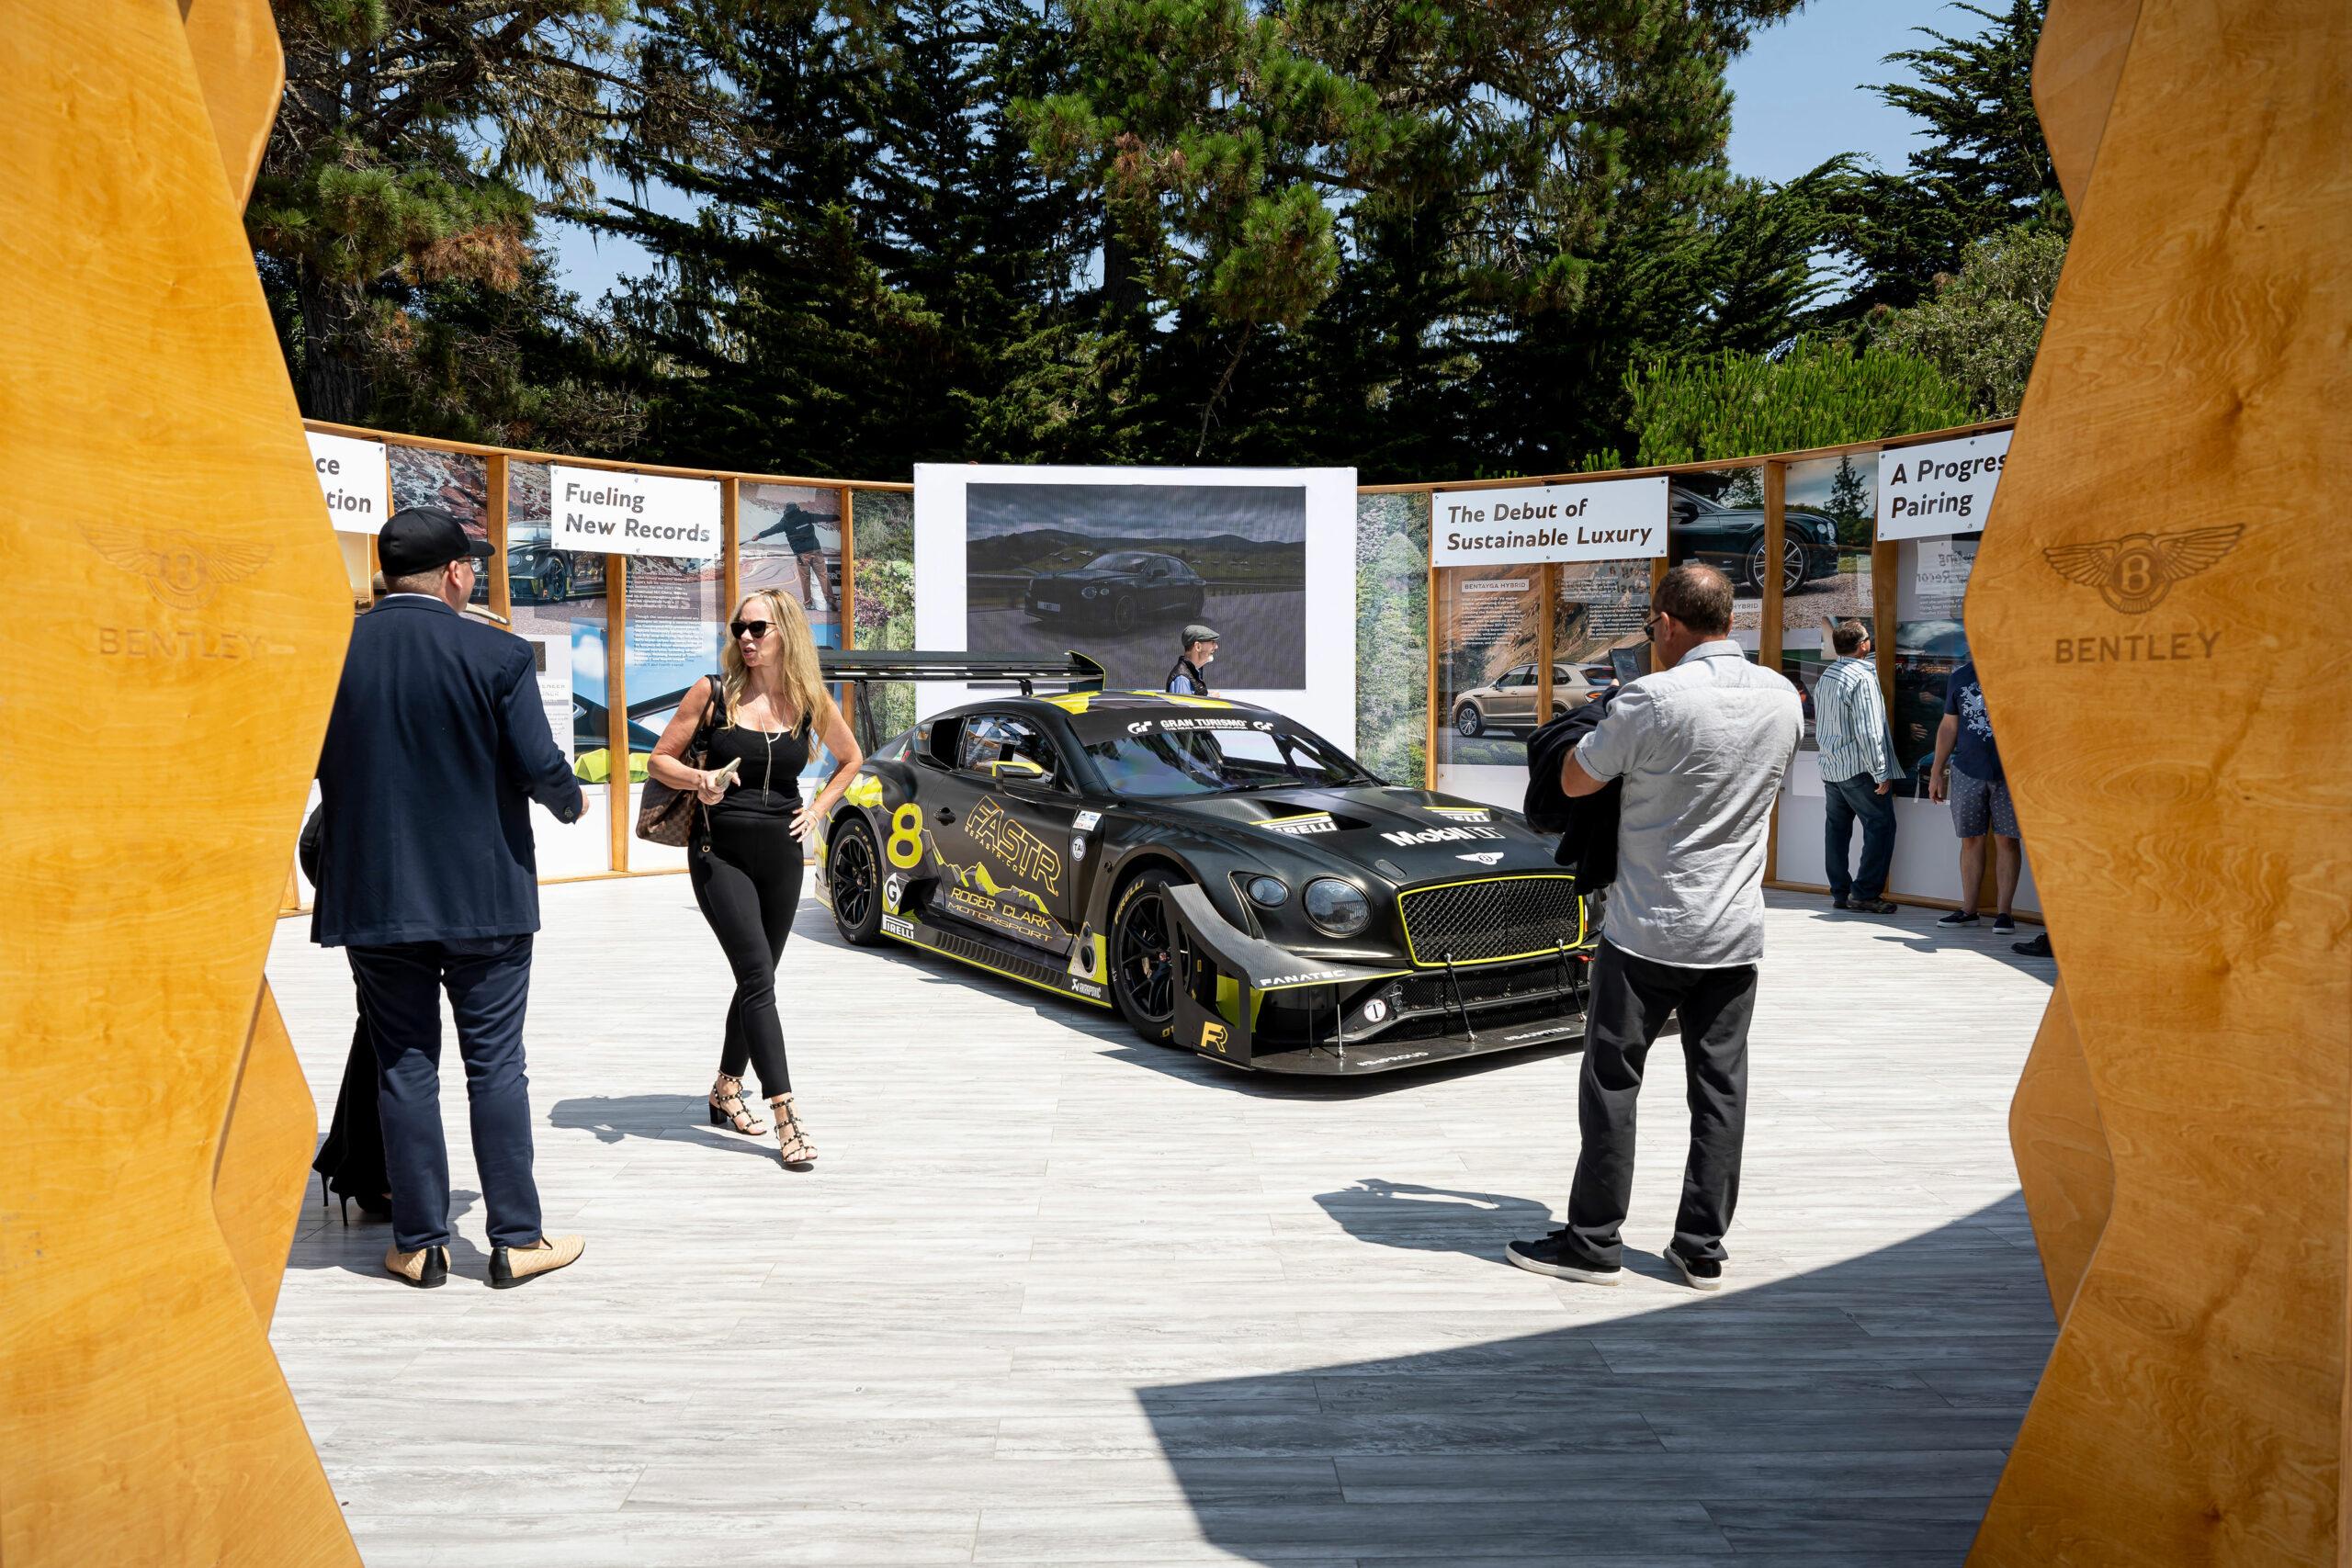 Bentley at Monterey Car Week